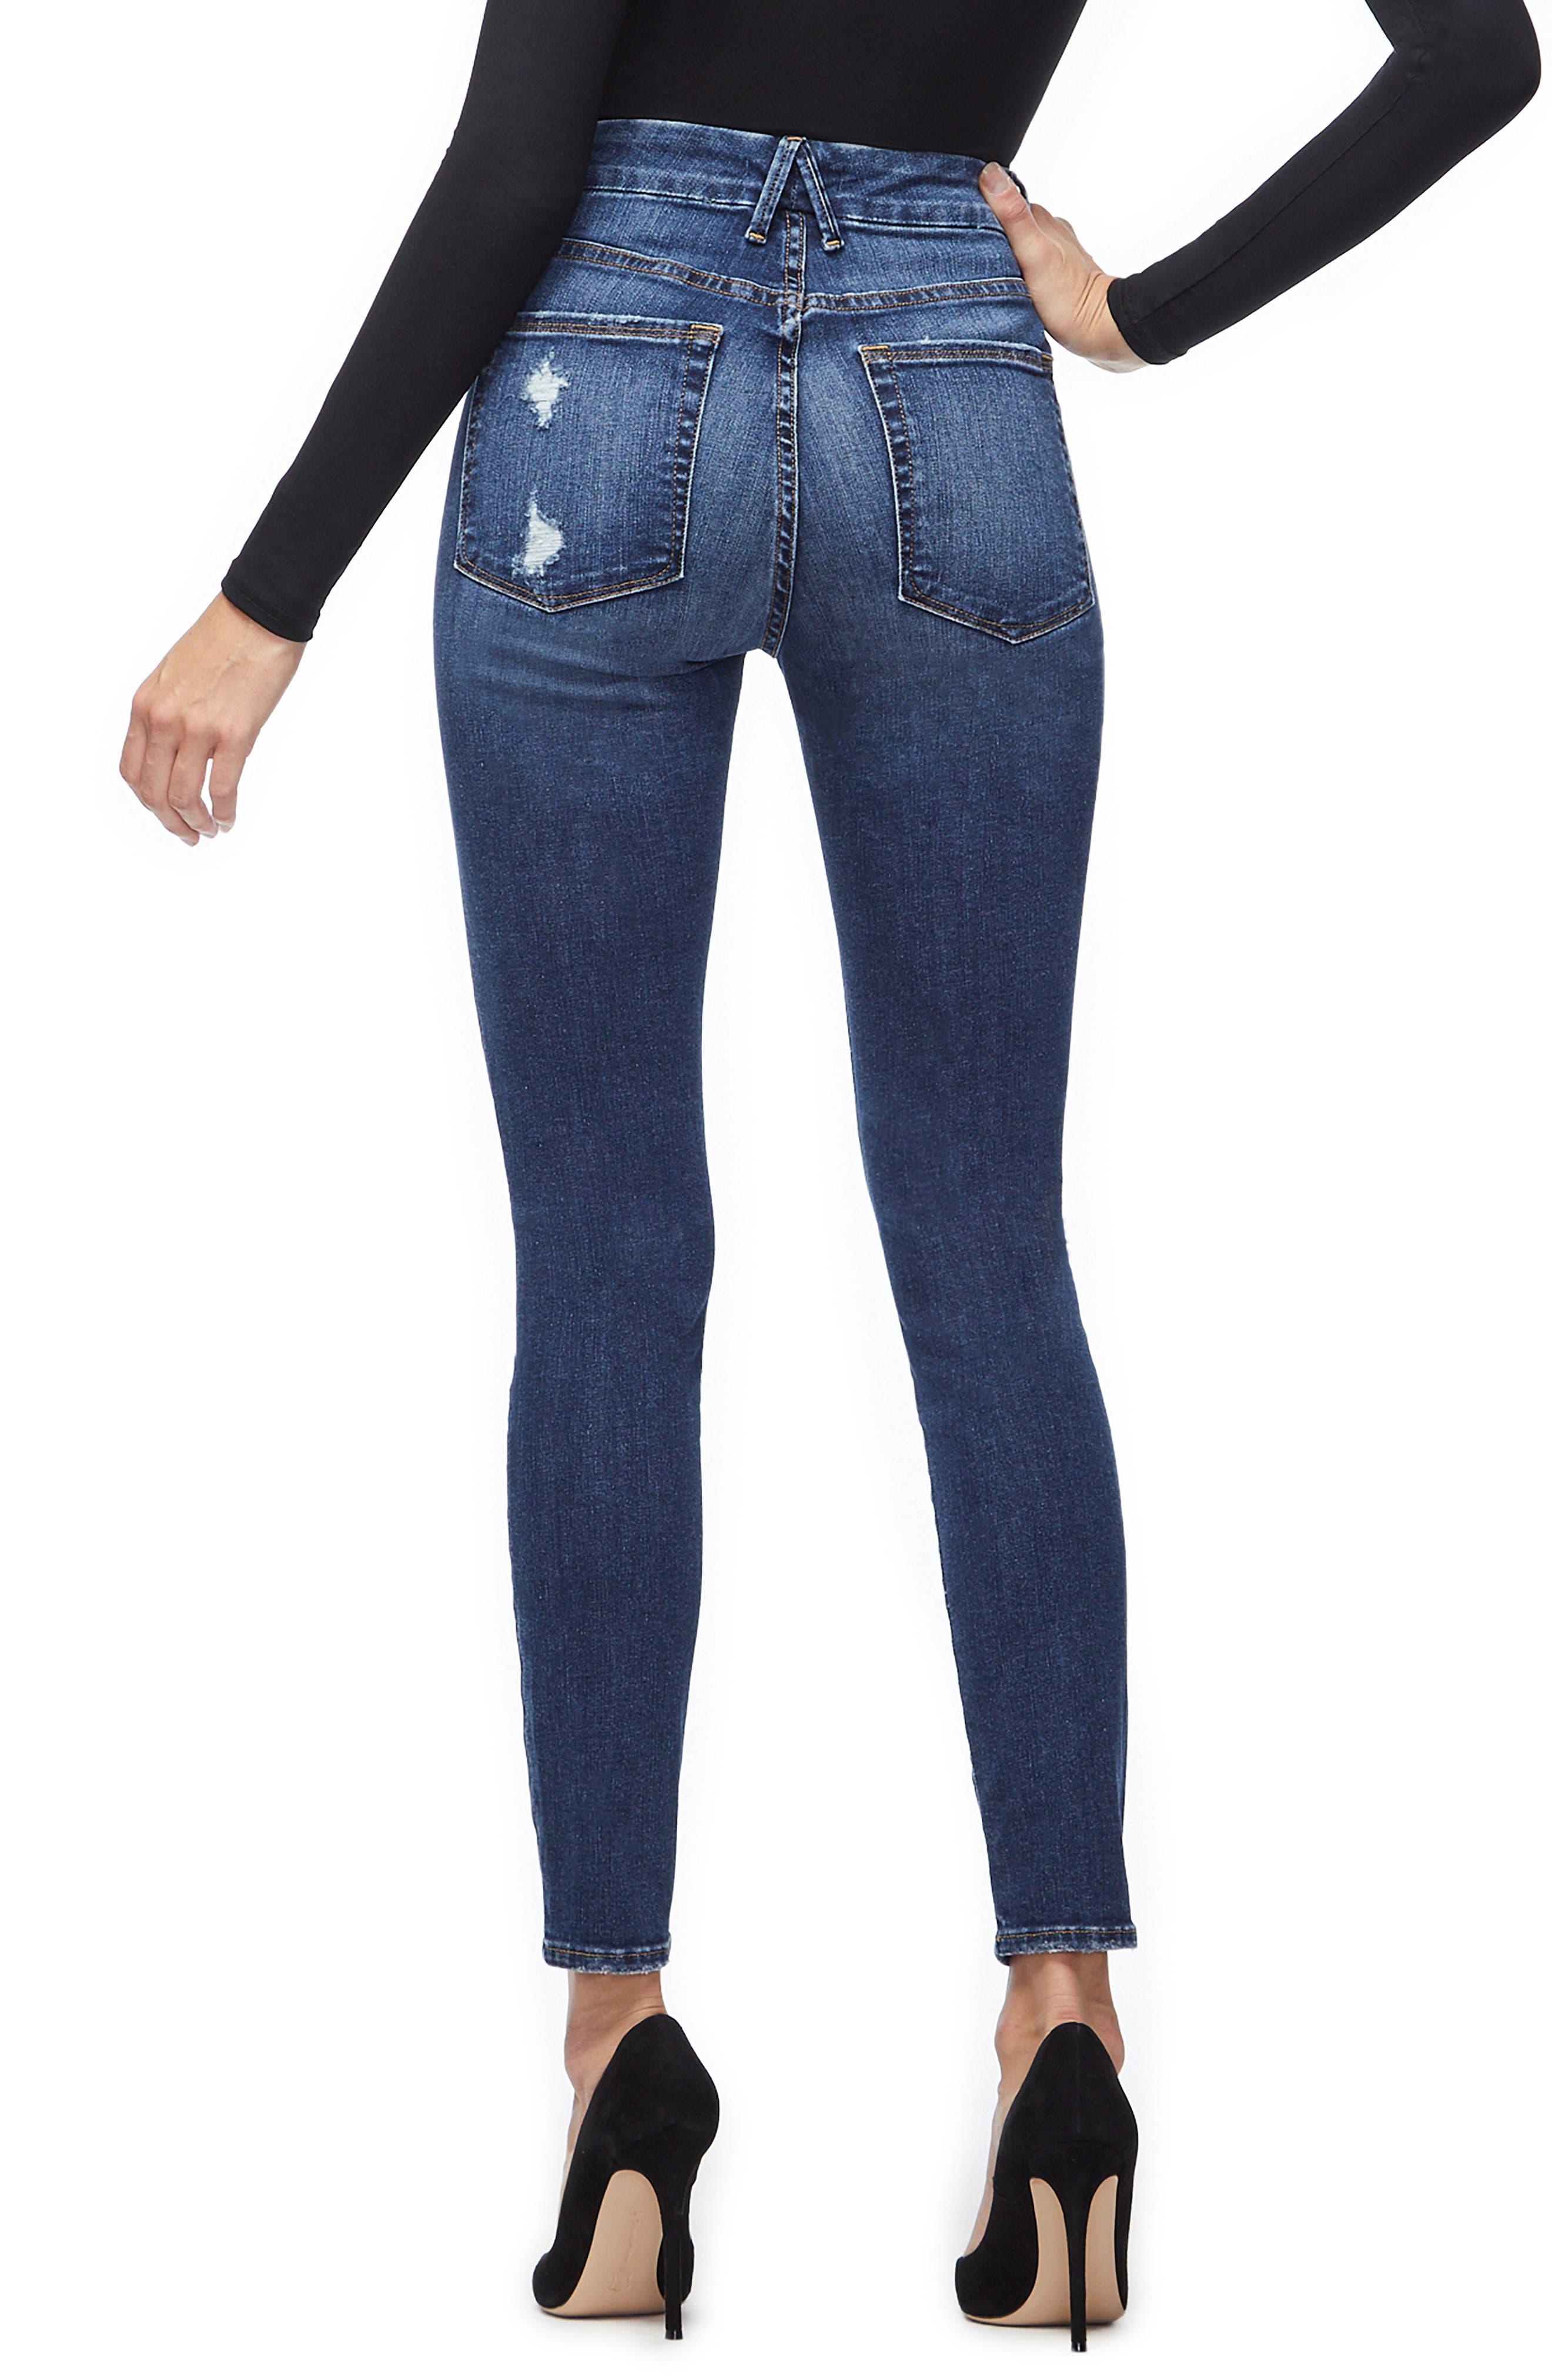 GOOD AMERICAN, Good Legs Cheetah Pockets High Waist Jeans, Alternate thumbnail 4, color, BLUE203